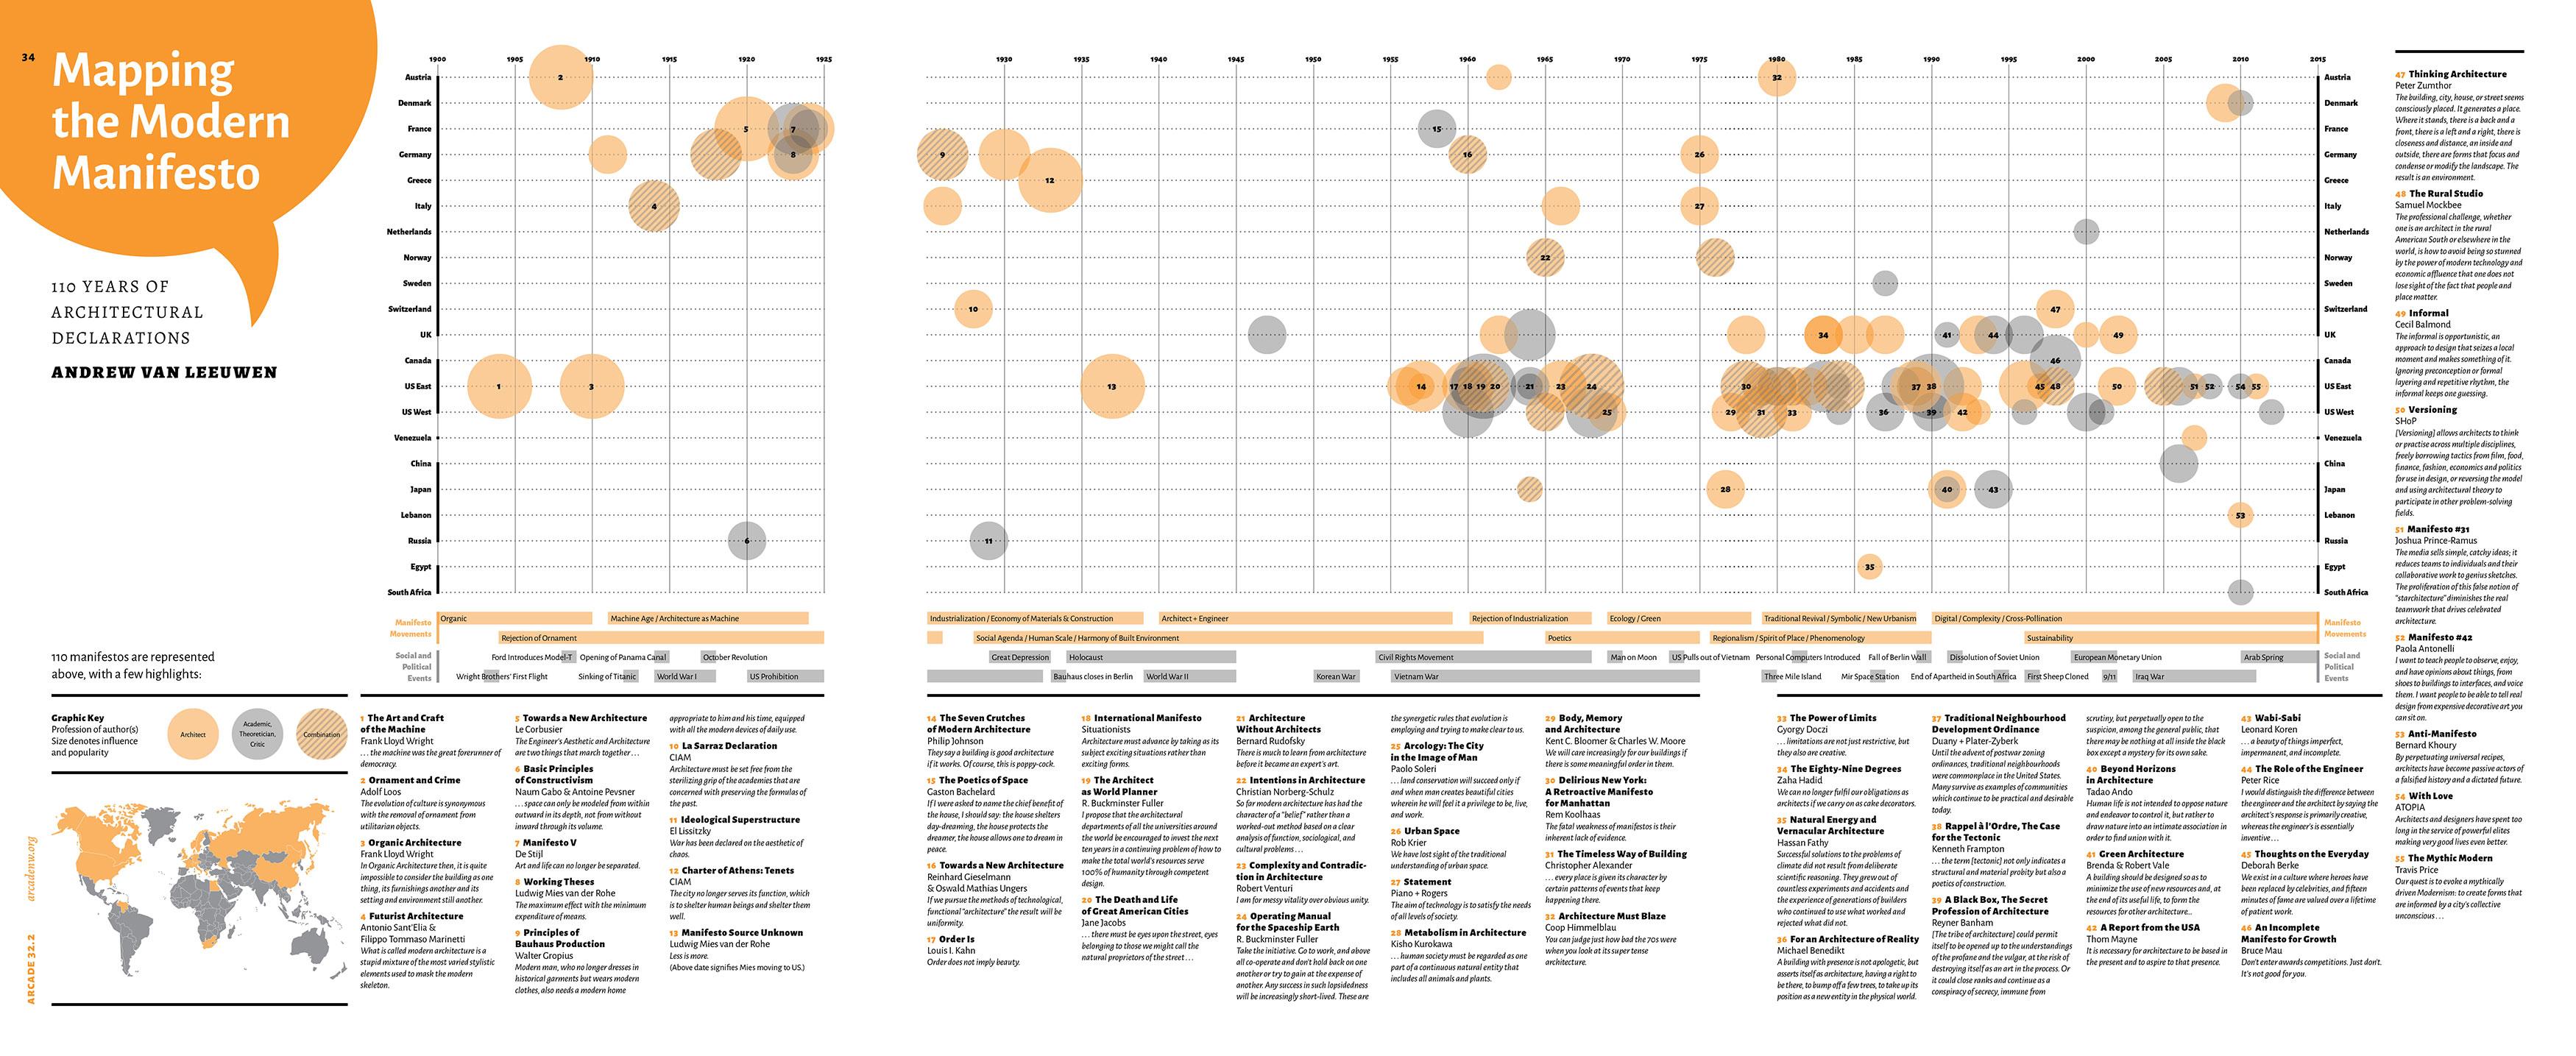 manifesto-infographic-3500